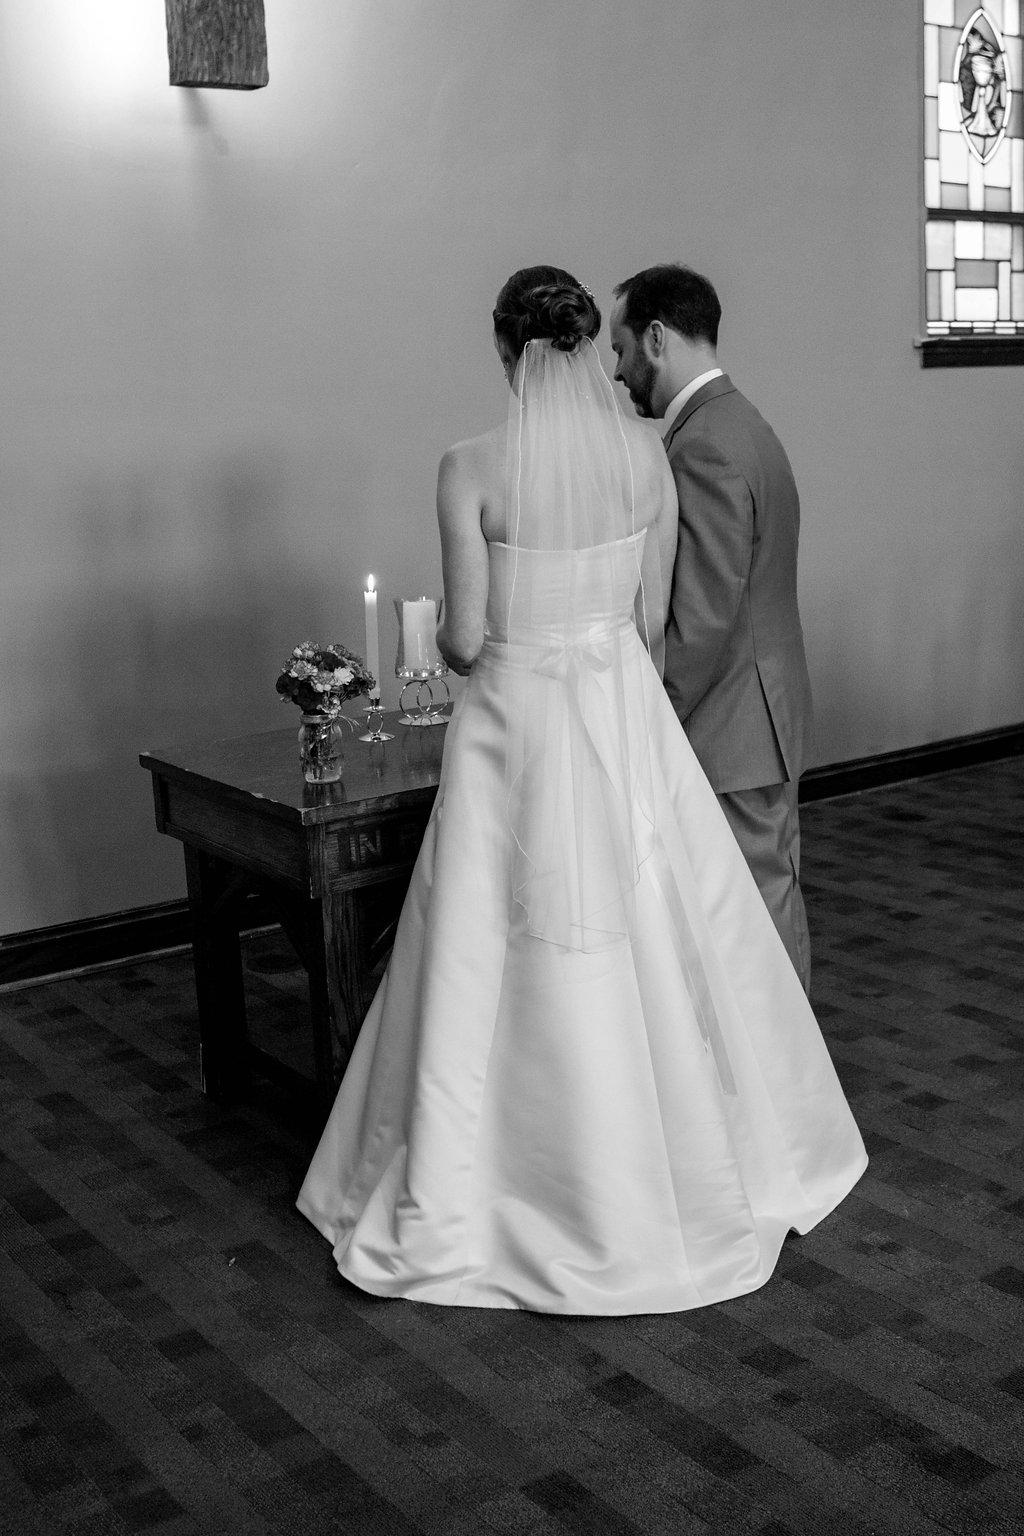 jakeandsuze_weddingselects-79.jpg